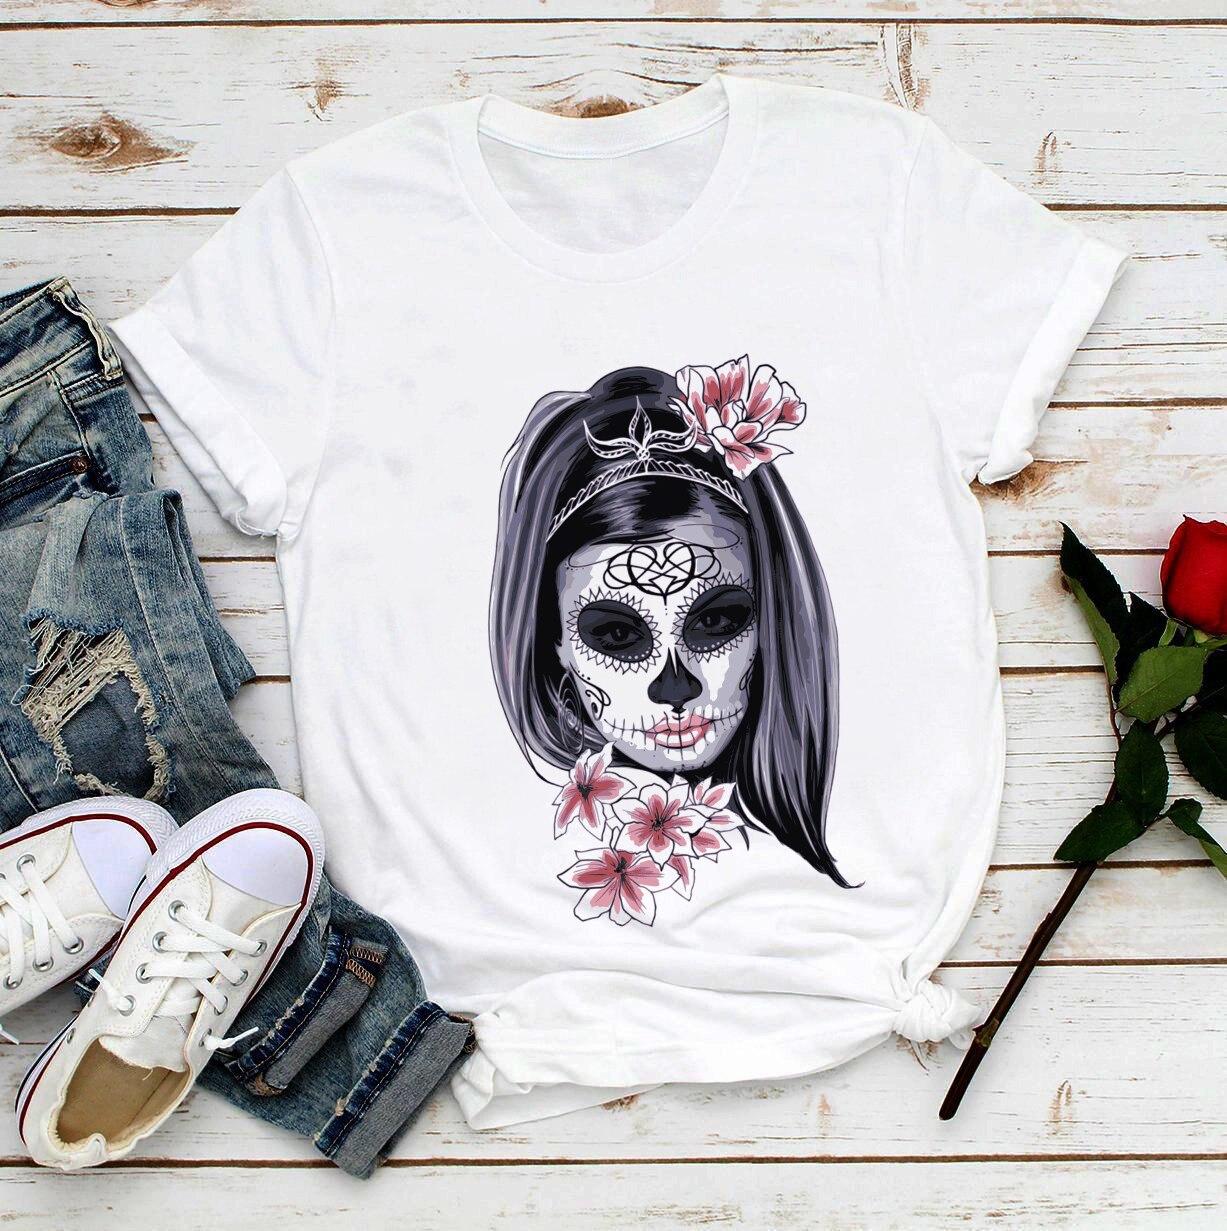 Mexico Day Of The Dead Calavera Sugar Skull Funny T-shirt Women Summer New White Casual Sweet Kawaii T Shirt Femme